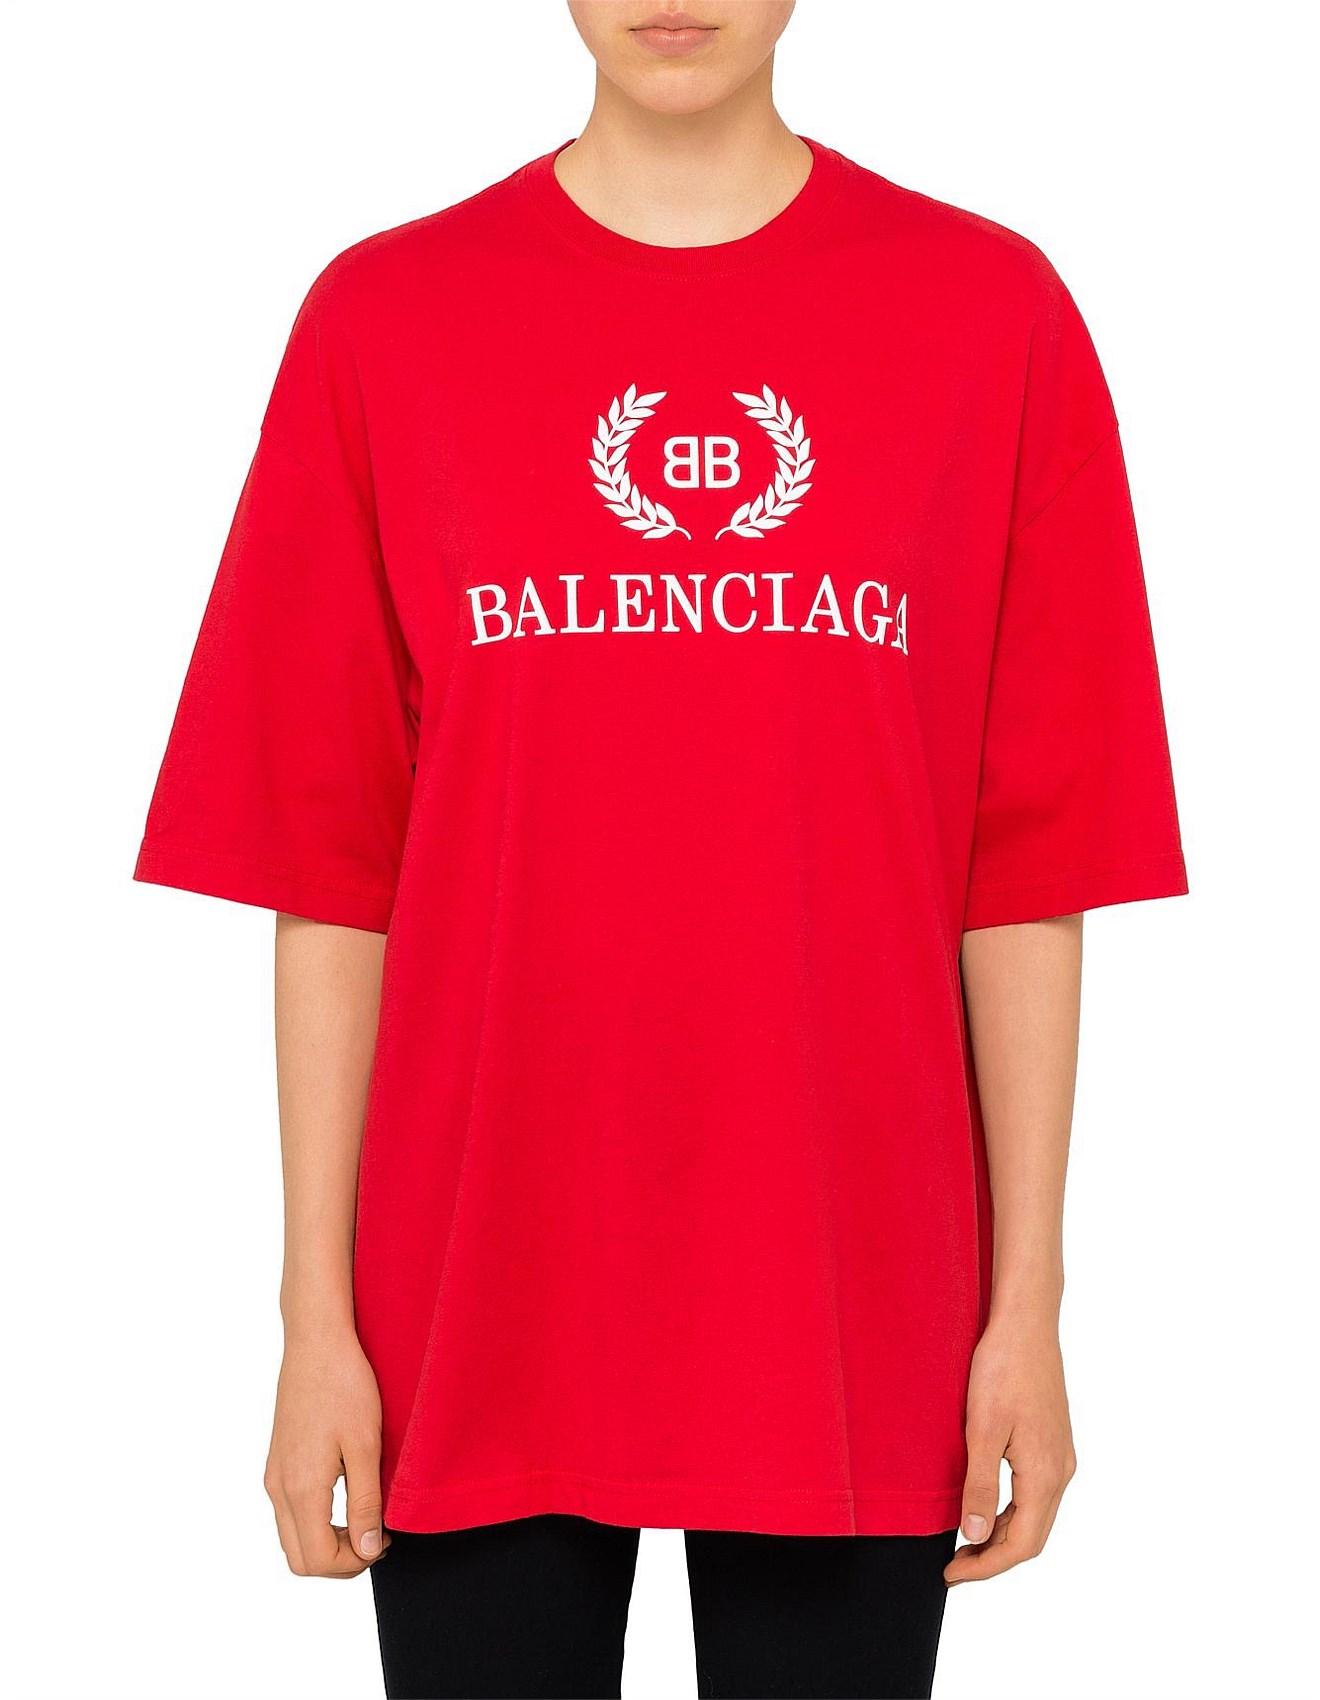 aa39bac90d9 BB Logo Oversized Logo T-Shirt